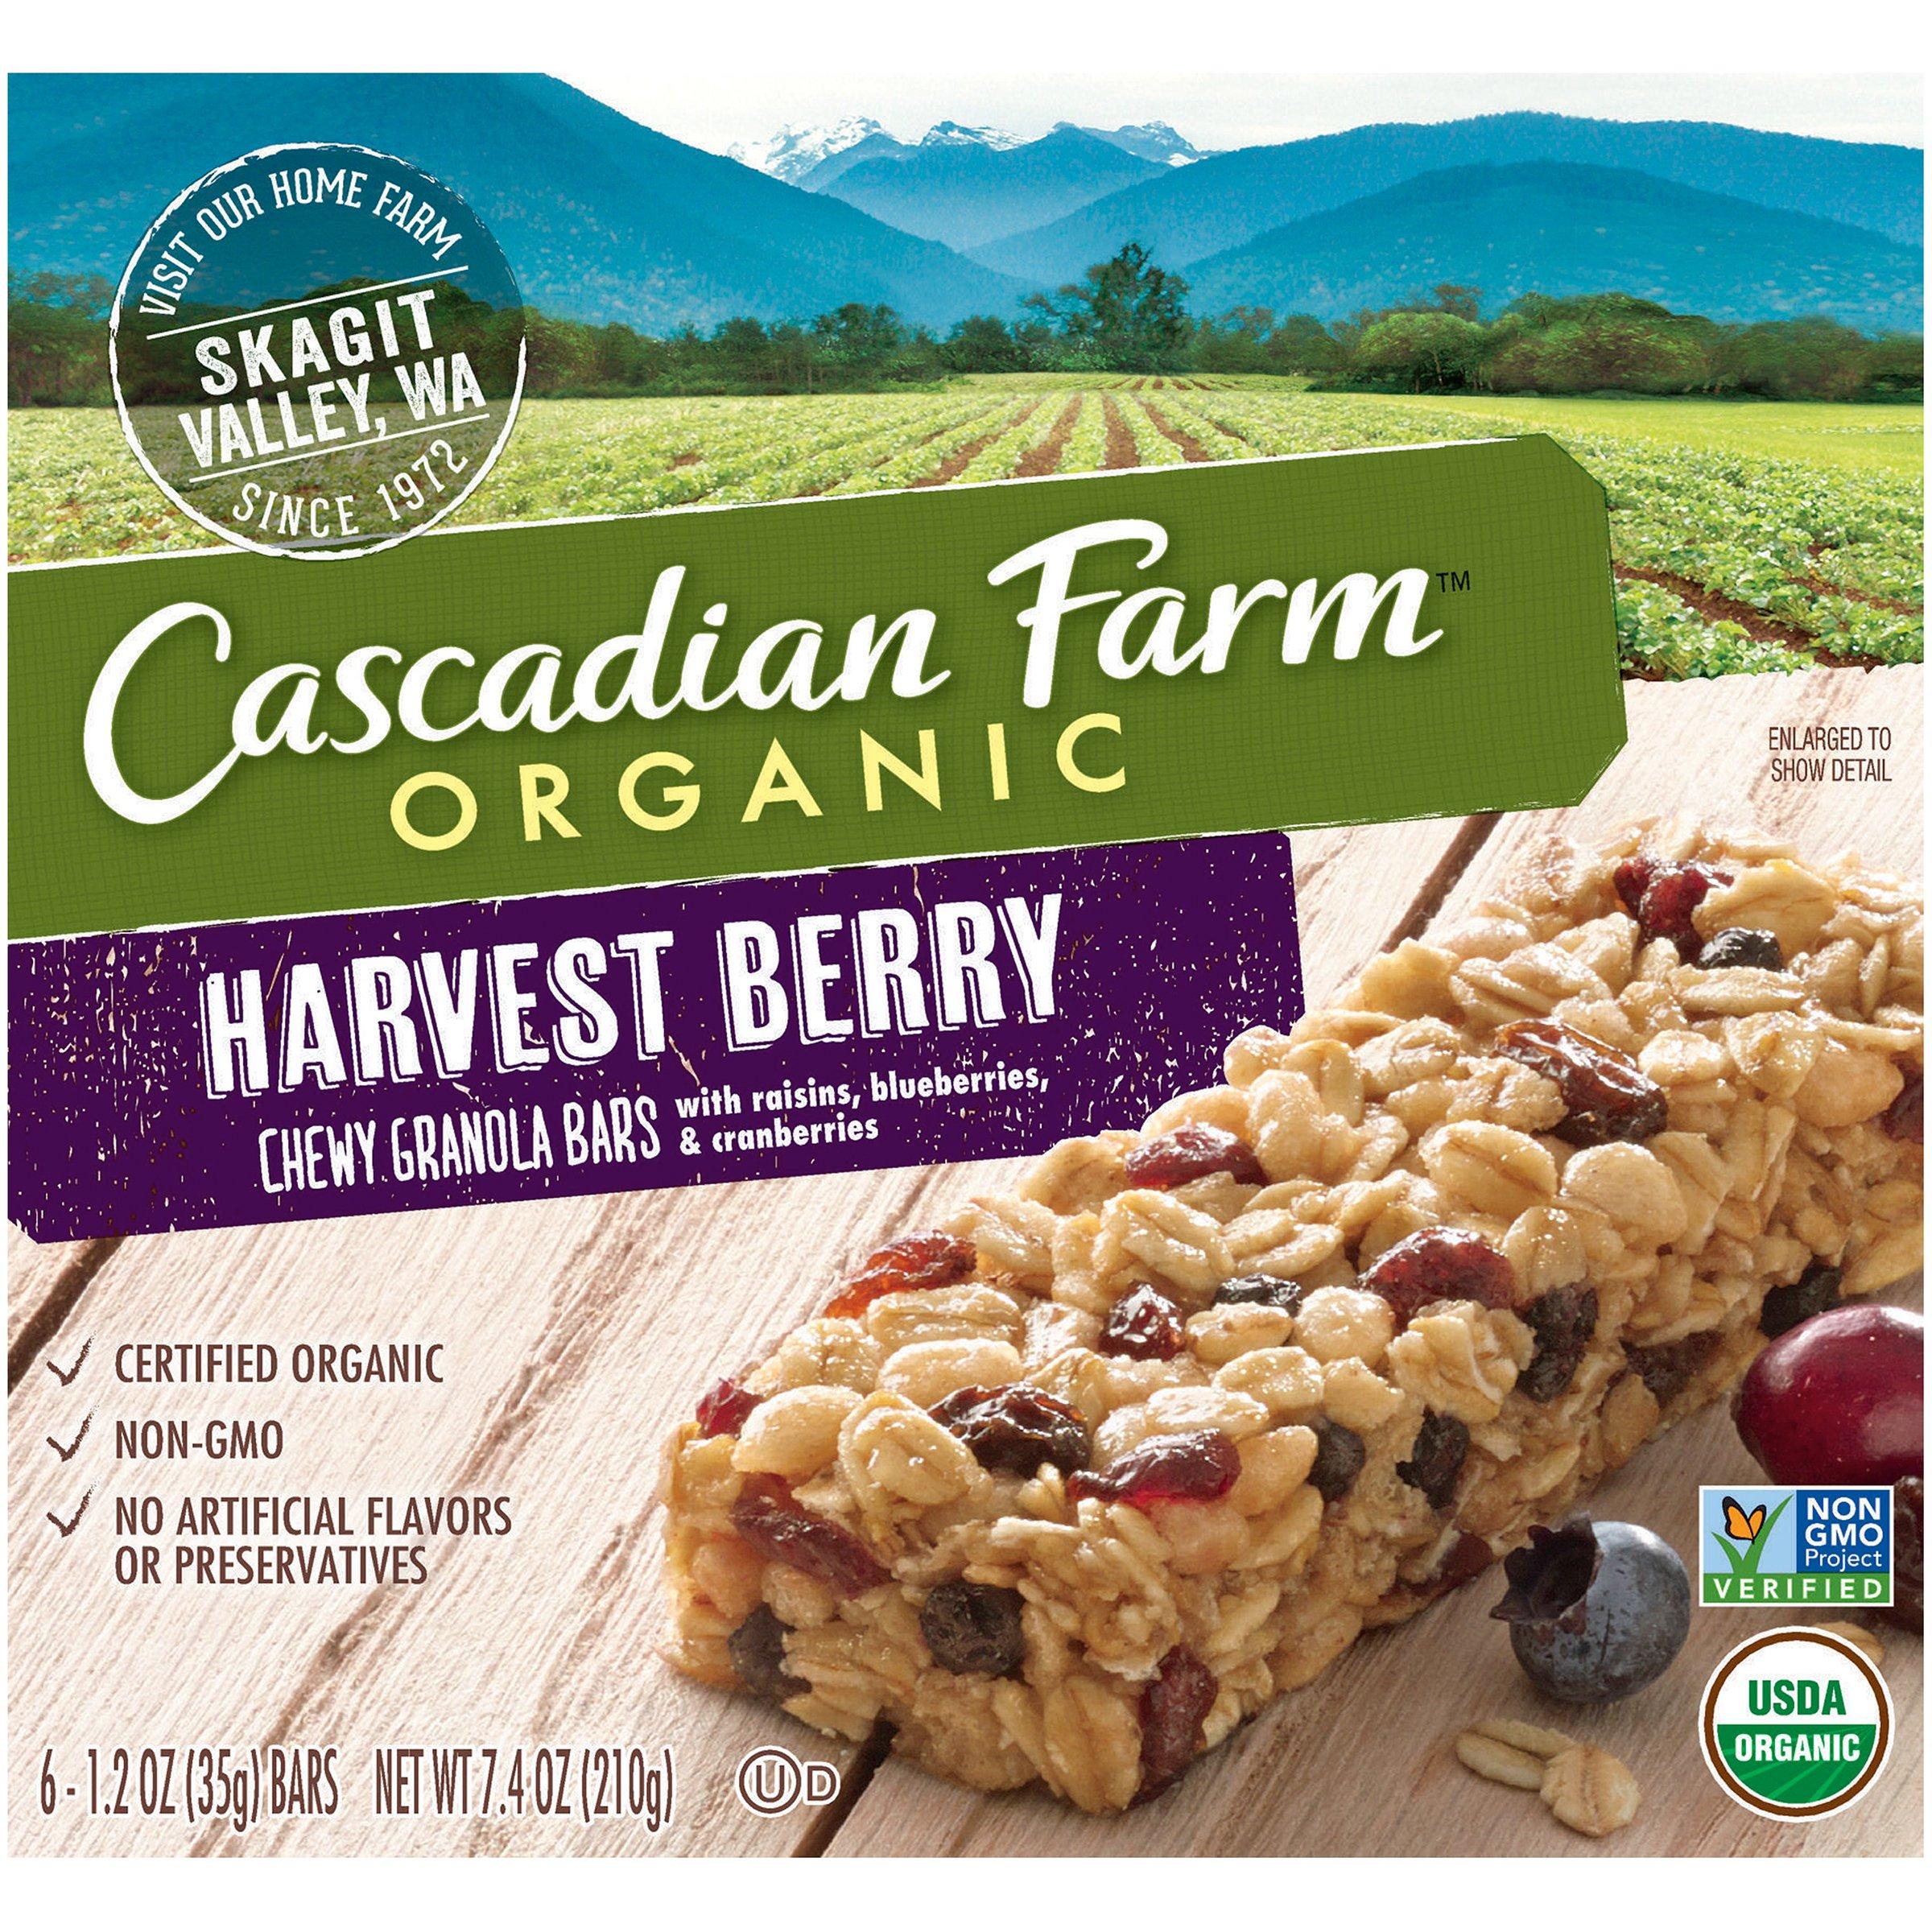 Cascadian Farm Chewy Granola Bar Organic non-GMO Harvest Berry 6-1.2 oz Bars